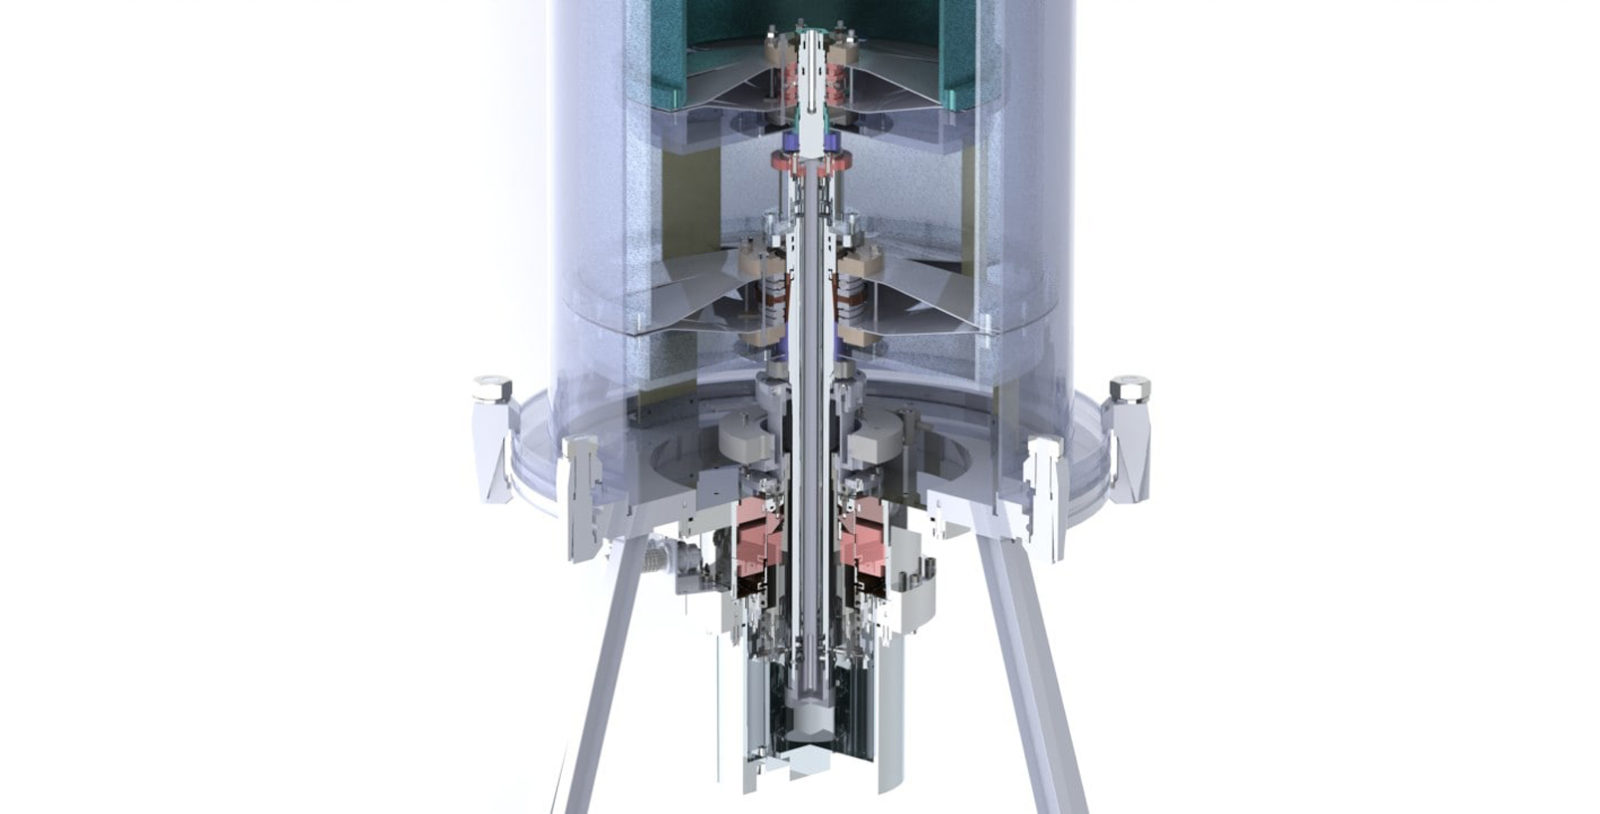 Cryogenics_Criostat_Astronomical_Instrumentation_I_D_i_IDOM_ADA_3_